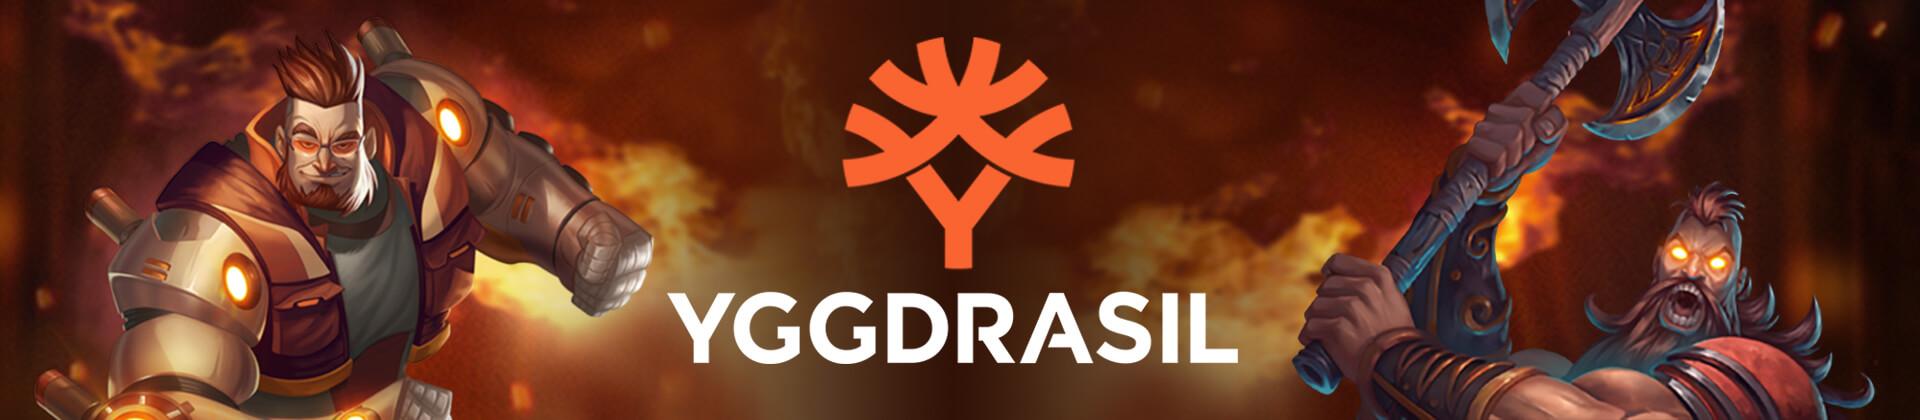 Yggdrasil CS Gamevy